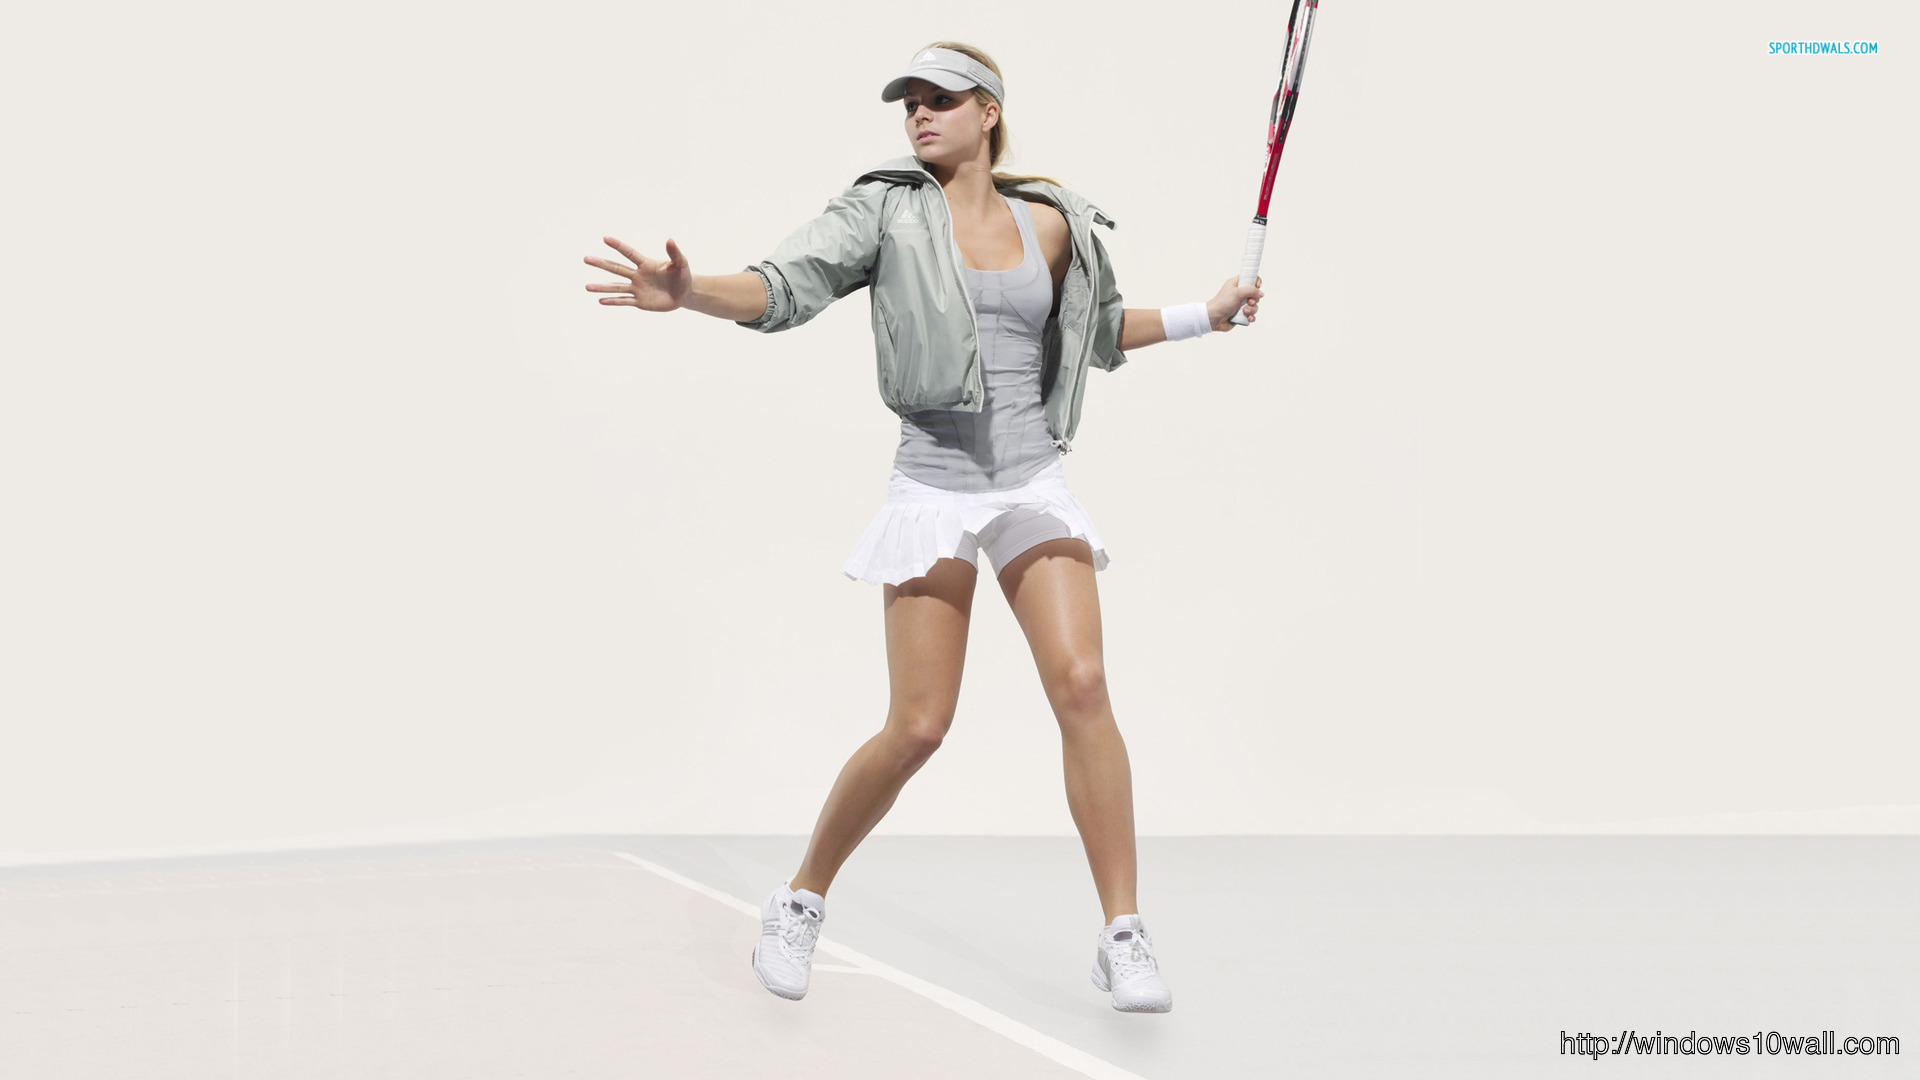 Maria Kirilenko Tennis Star 1920x1080 Wallpaper